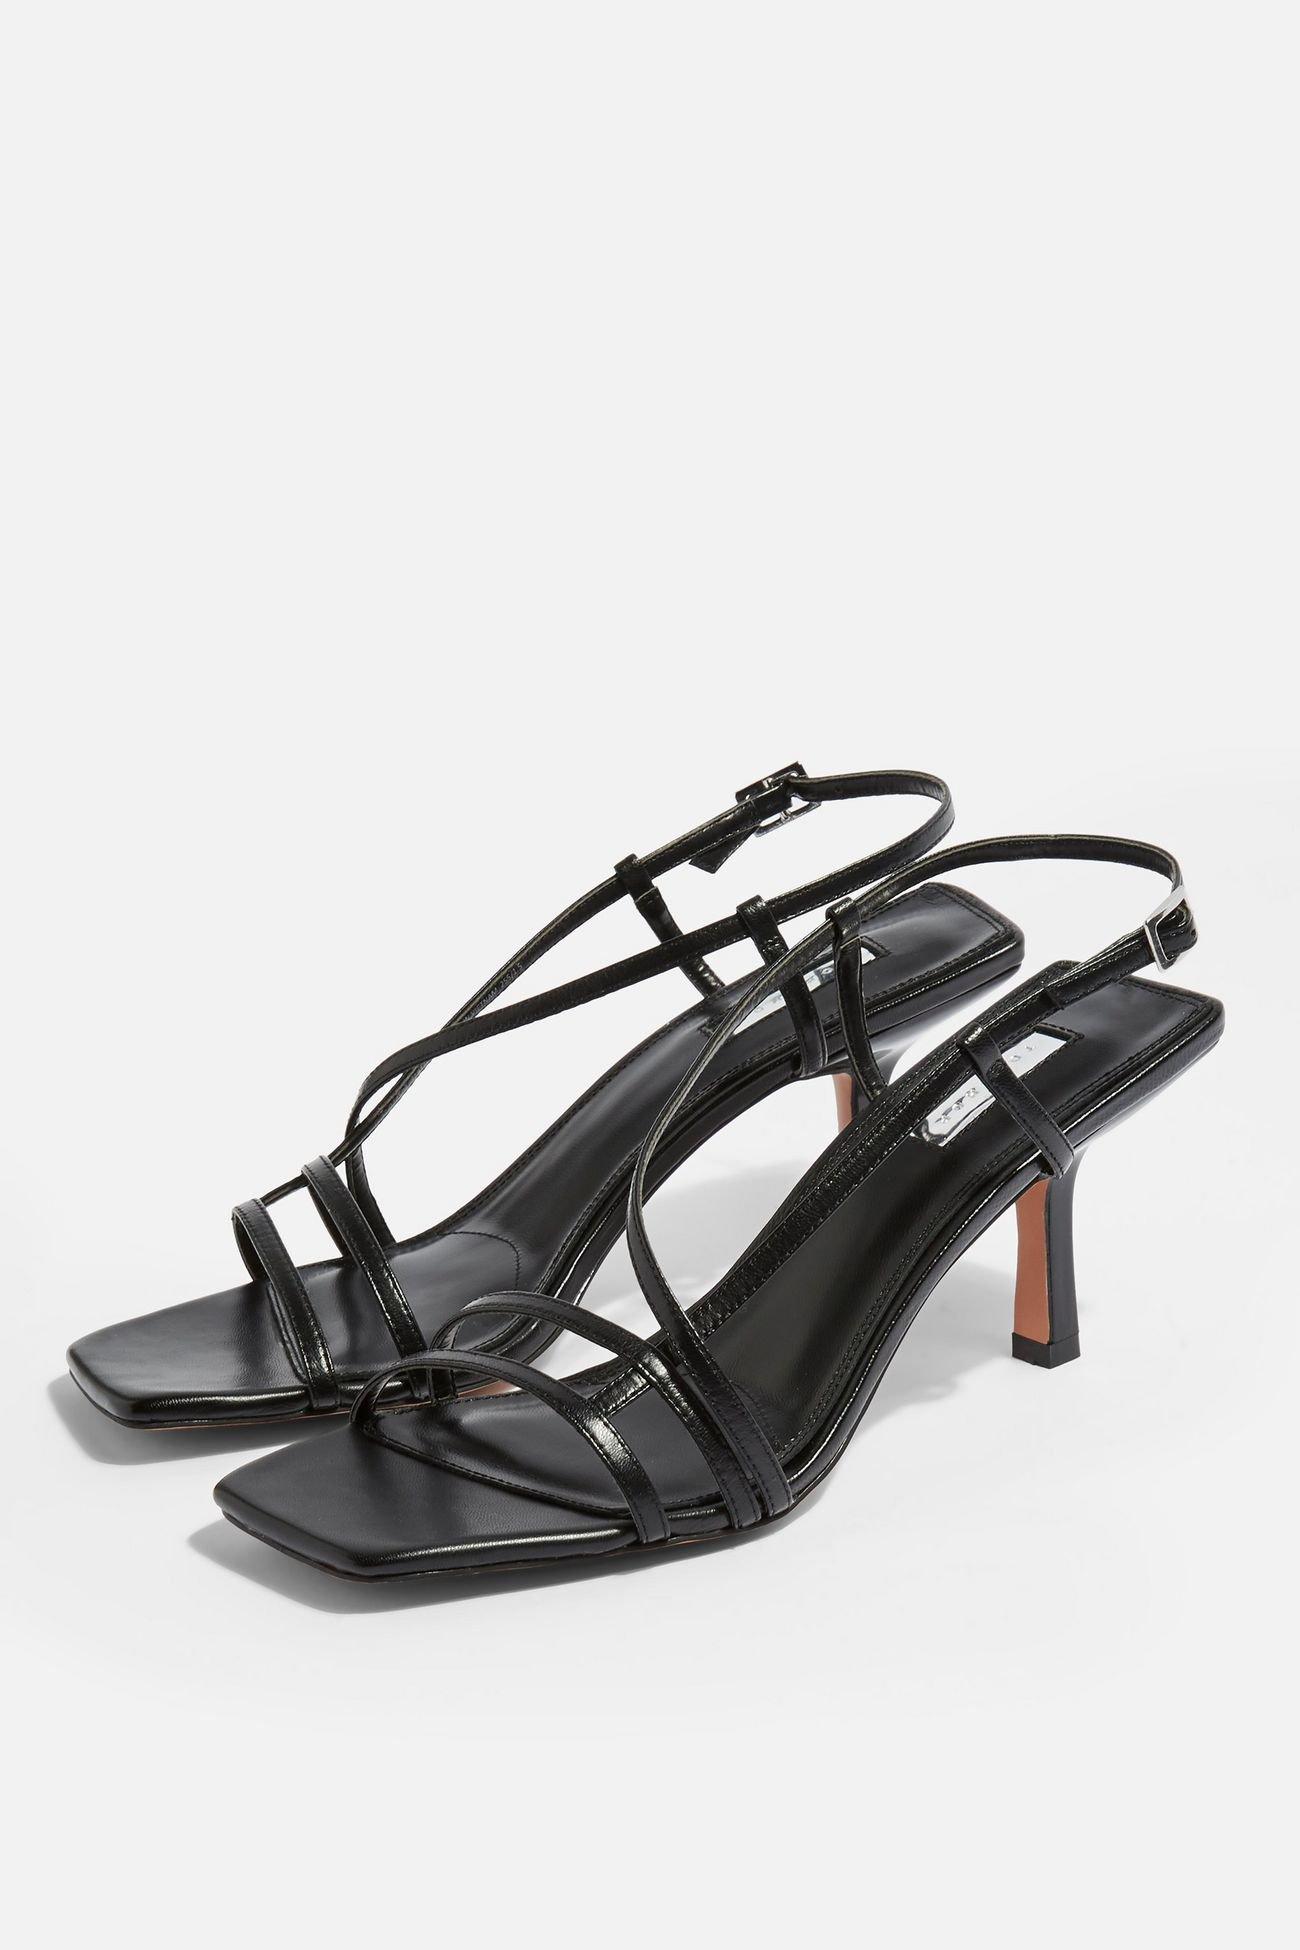 STRIPPY Black Heeled Sandals | Topshop